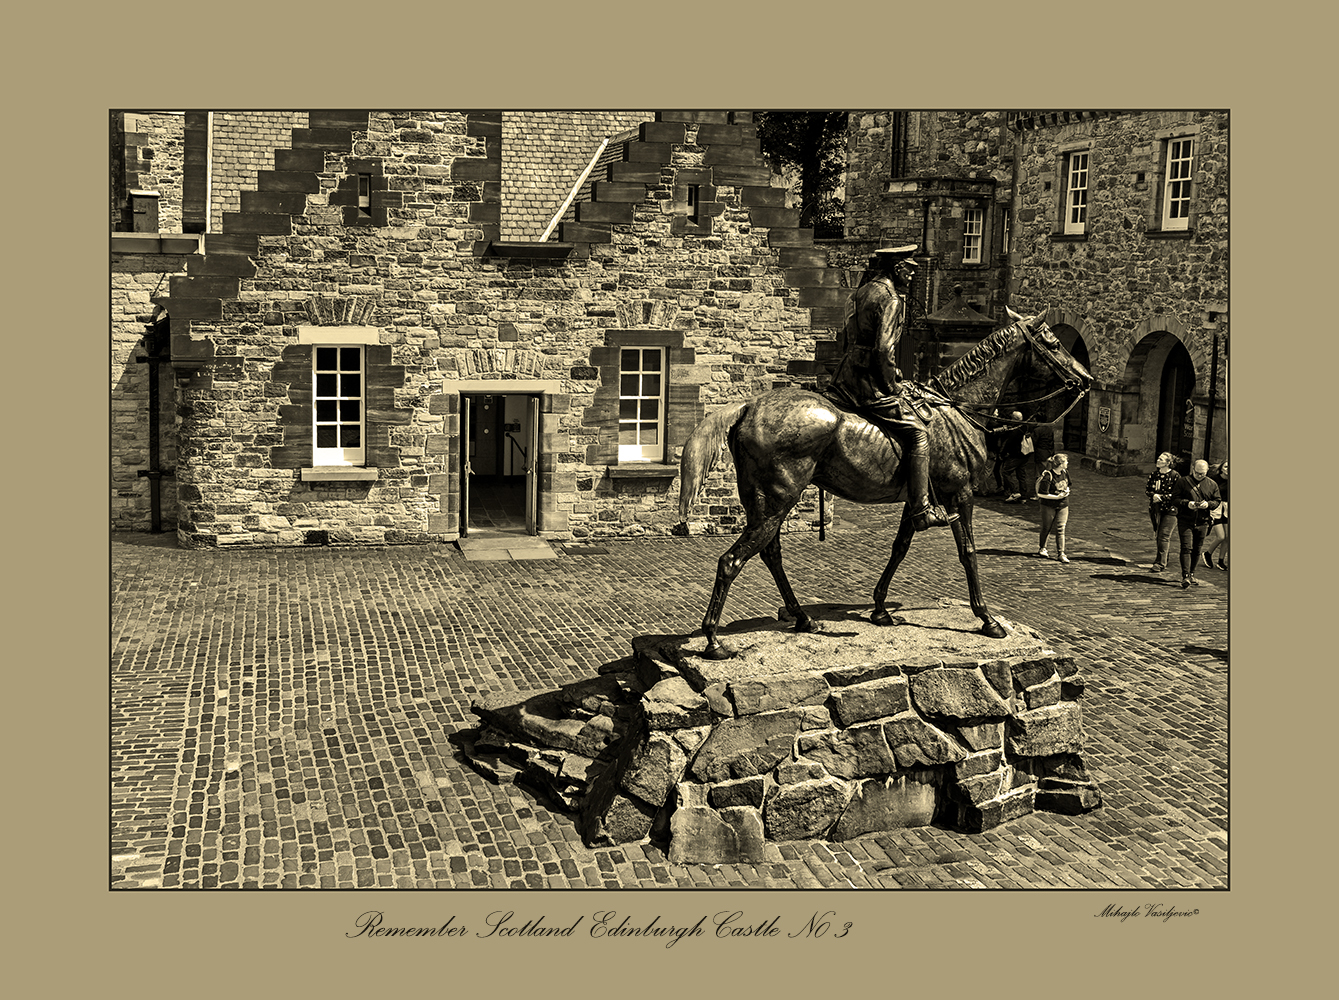 Remember Scotland Edinburgh Castle No 3